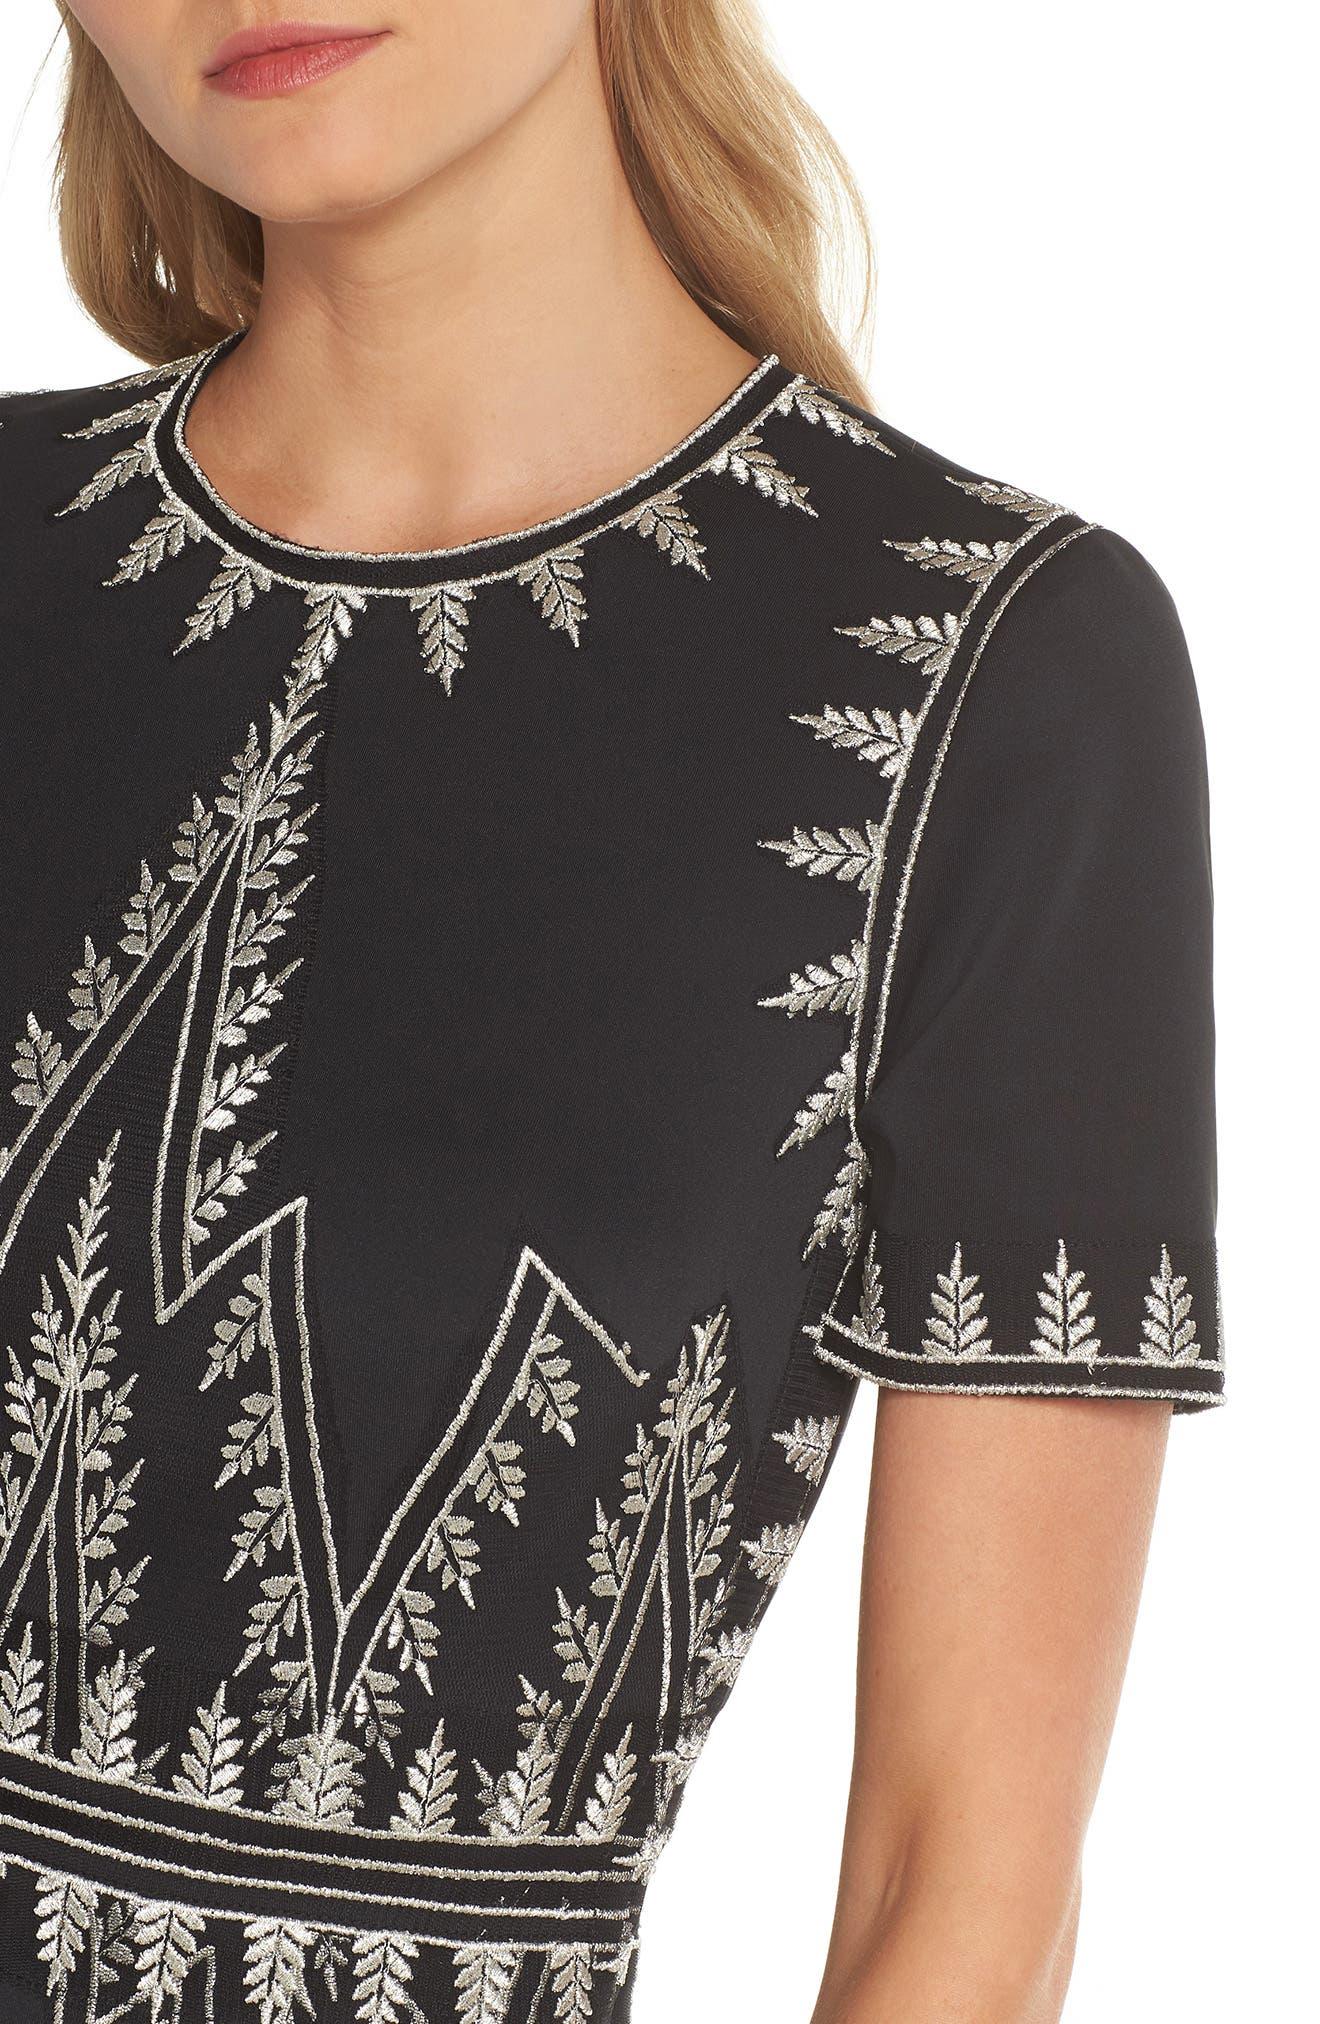 Embroidered Chevron Dress,                             Alternate thumbnail 4, color,                             Black/ Silver